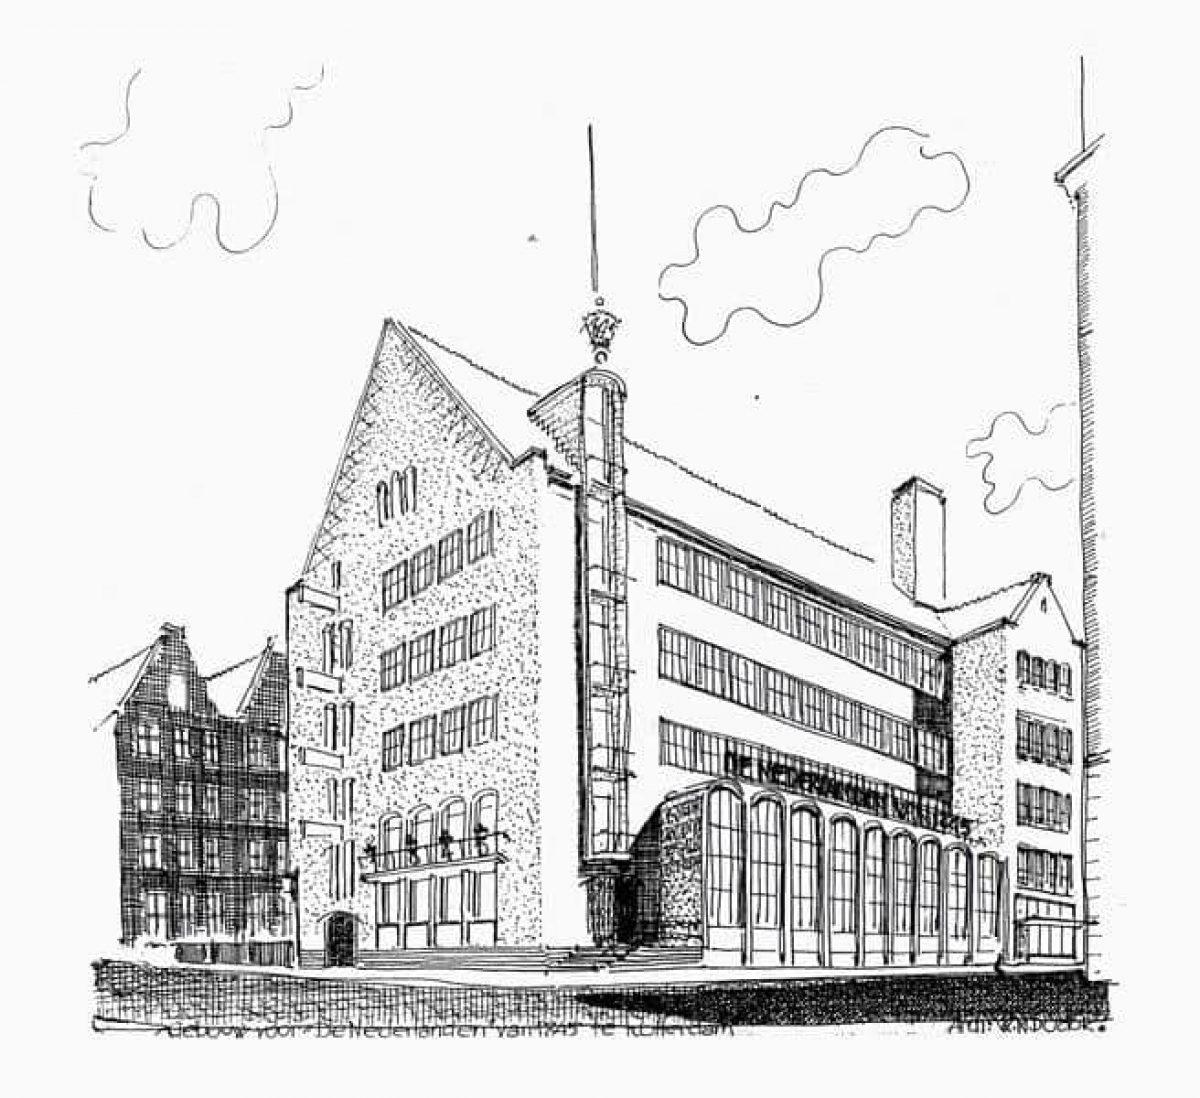 Nederlanden Van DudokPlatform Wederopbouw 1845café De Rotterdam SUqLMpVGz